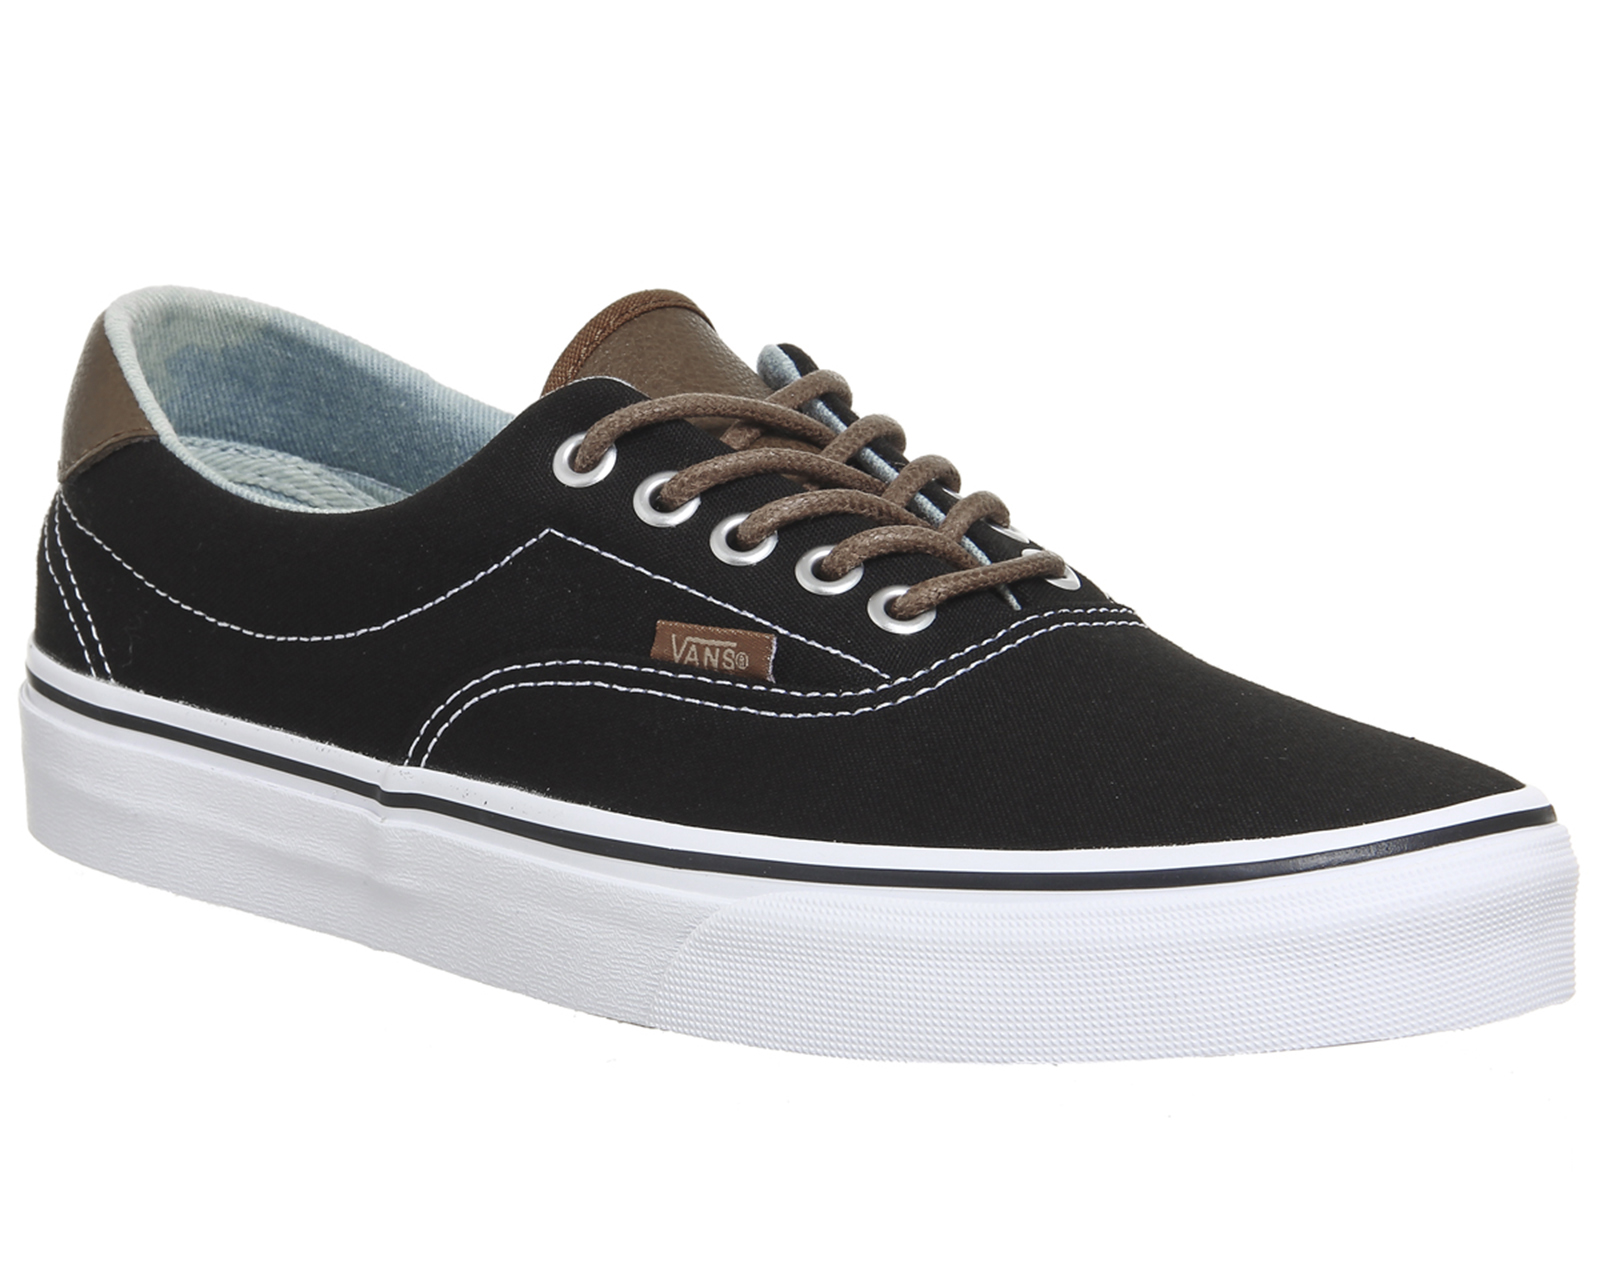 8f0ed226fd5218 Sentinel Womens Vans Era 59 Lace Up Trainers BLACK ACID DENIM Trainers Shoes